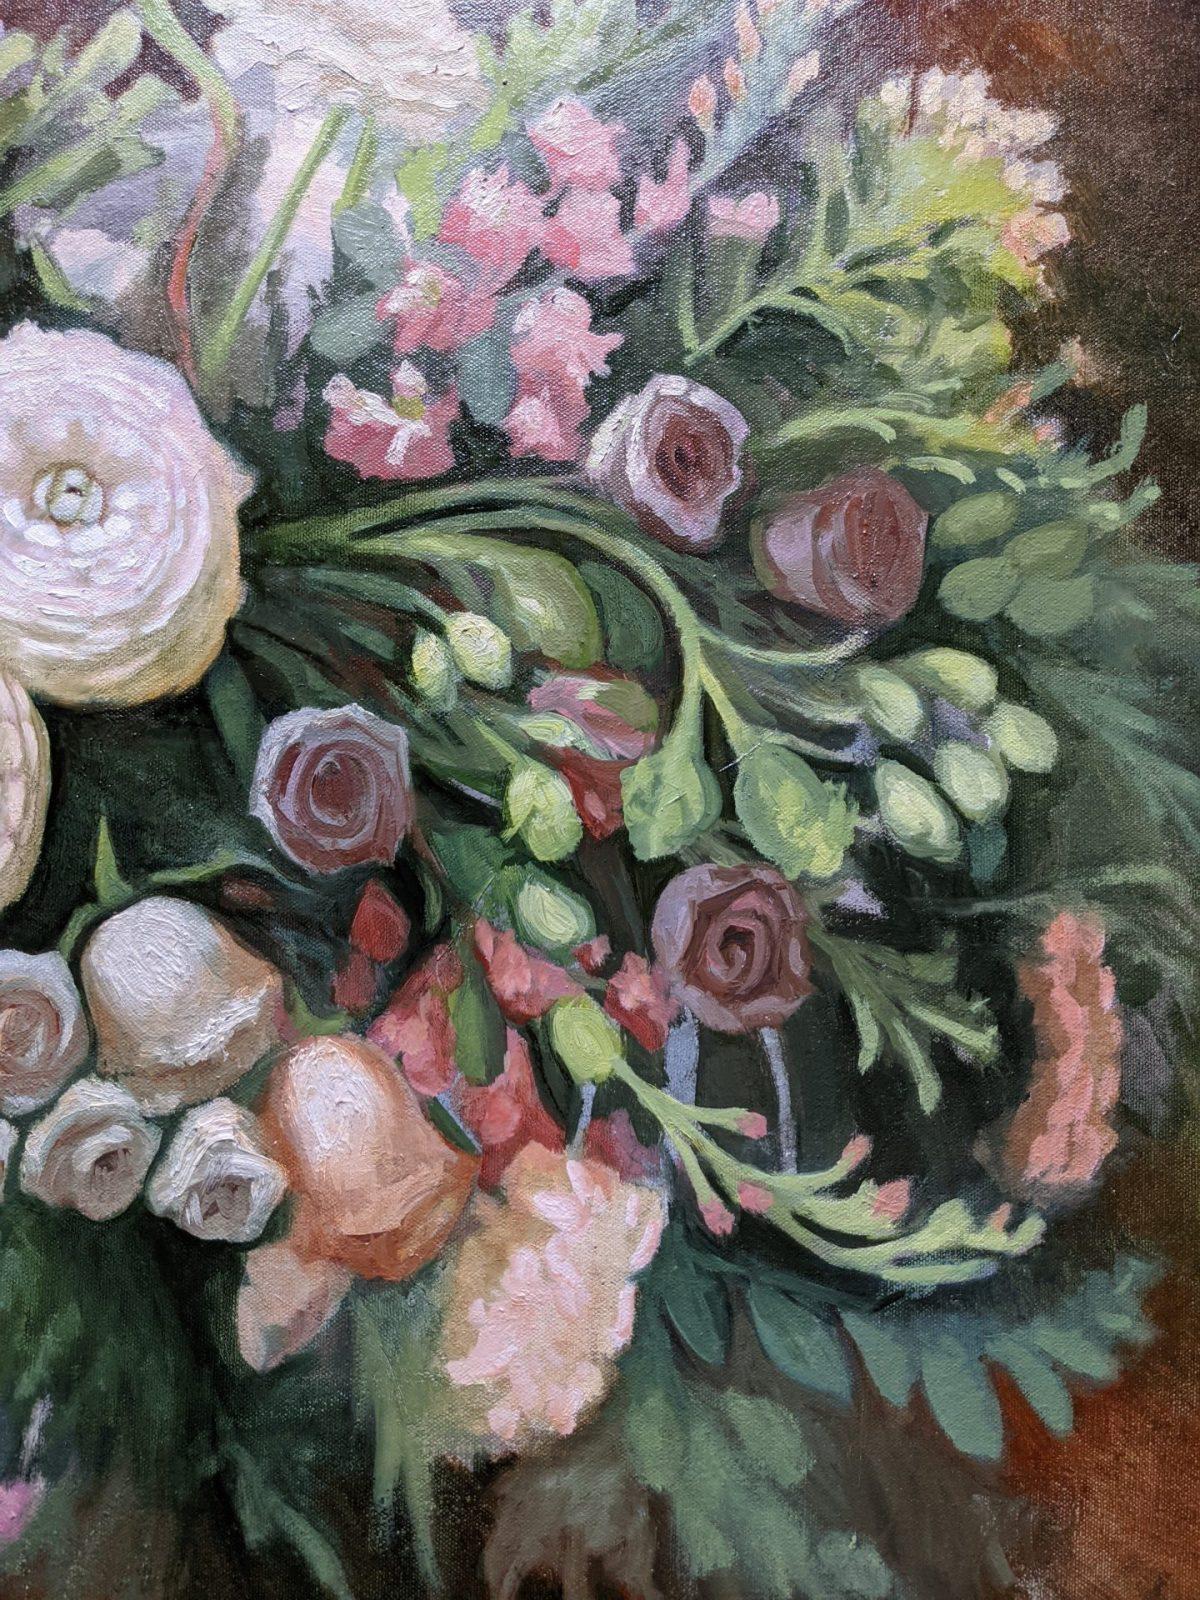 Arrangement-in-White-Oil-on-Canvas-24x30-Artist-Rebecca-King-Hawkinson-3600-sold-detail-2